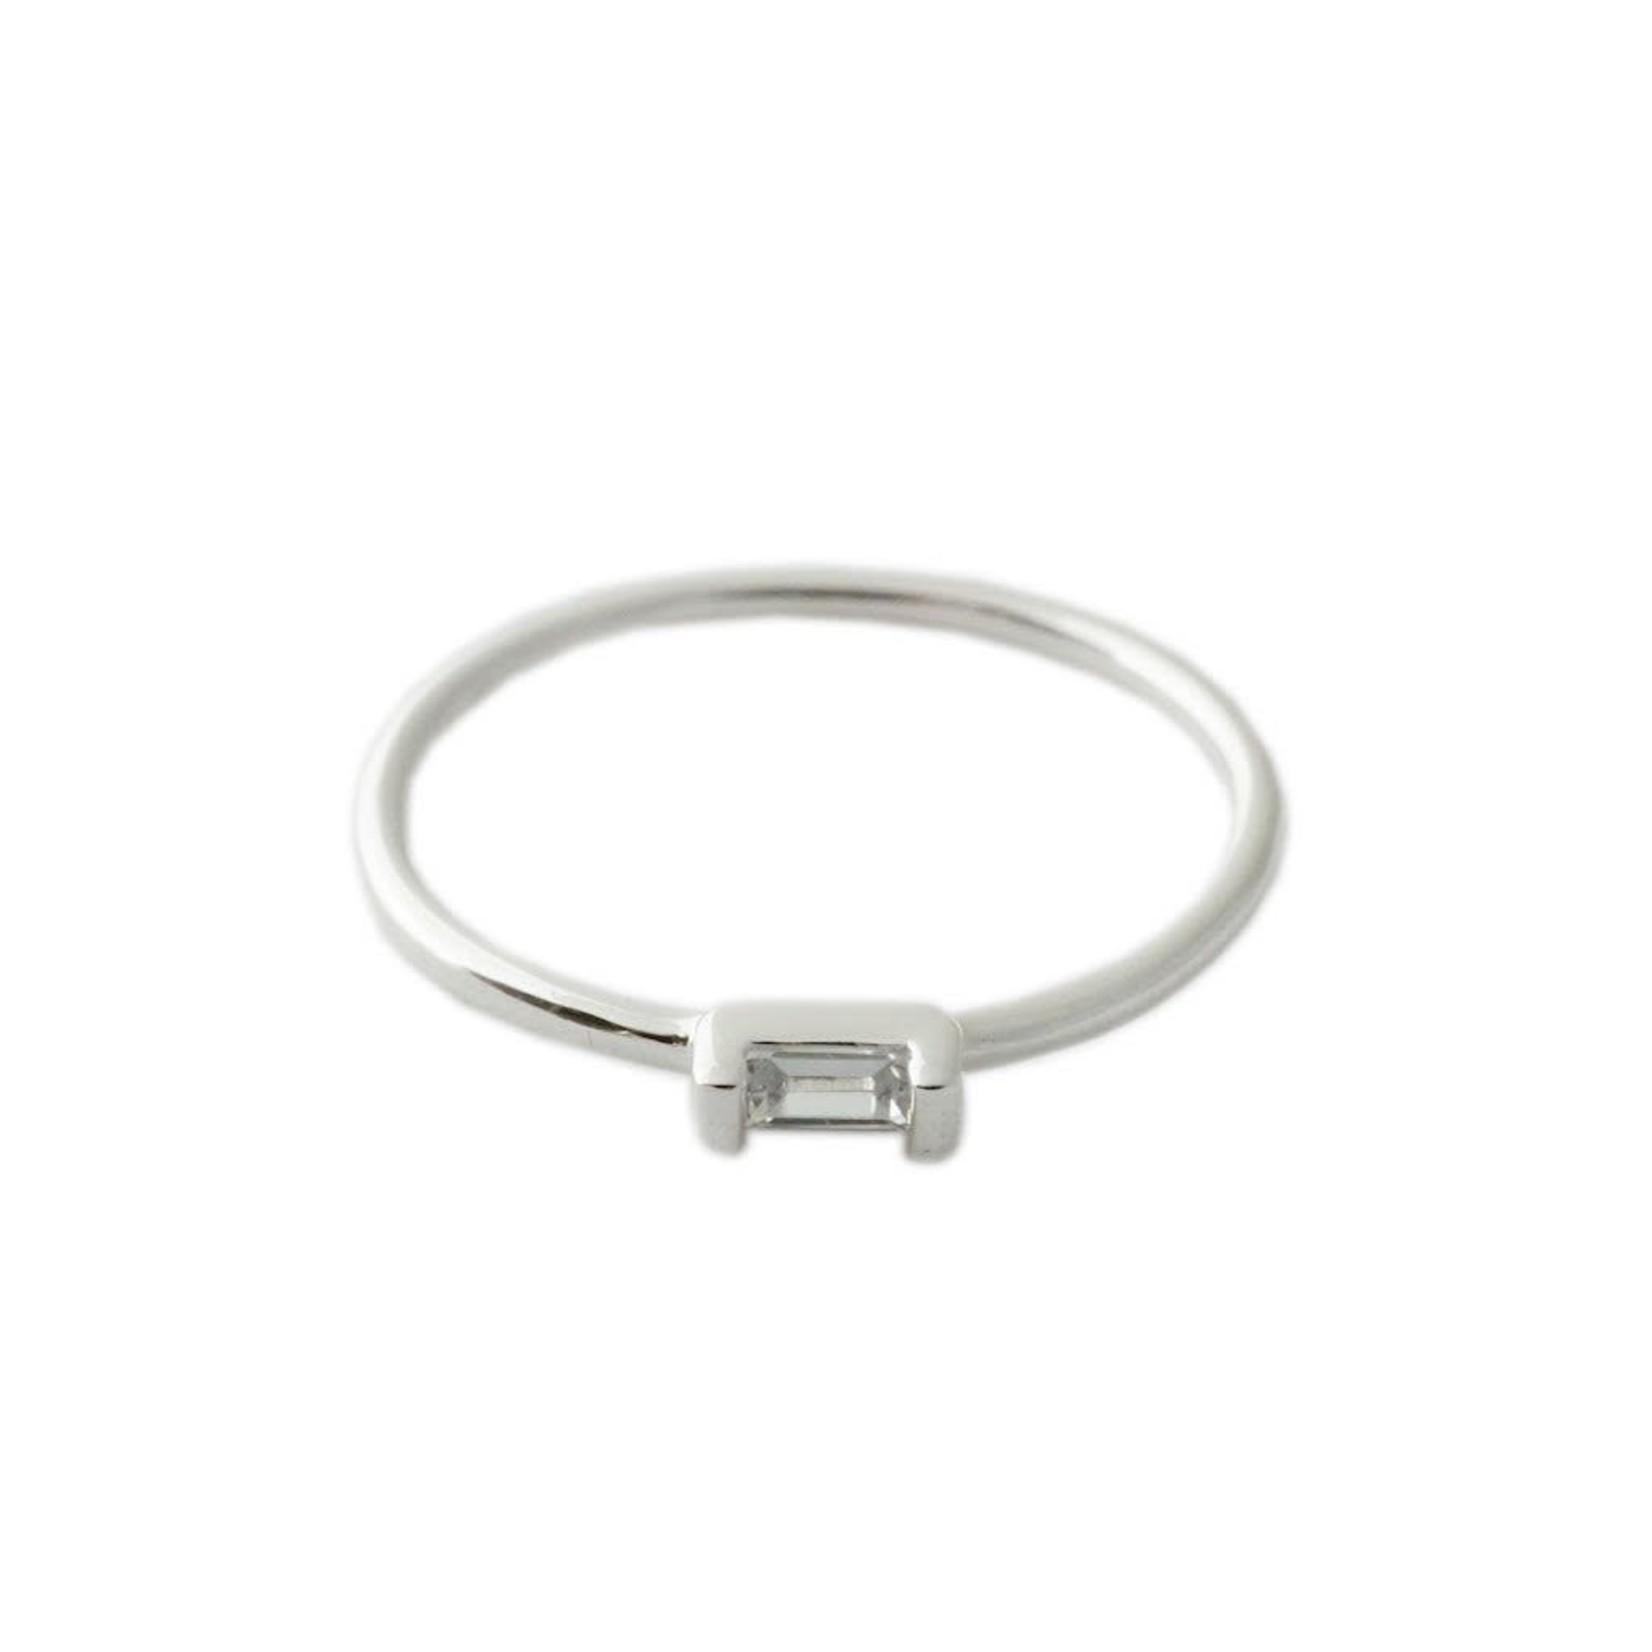 Honeycat Jewelry Honeycat Crystal Baguette Ring Silver